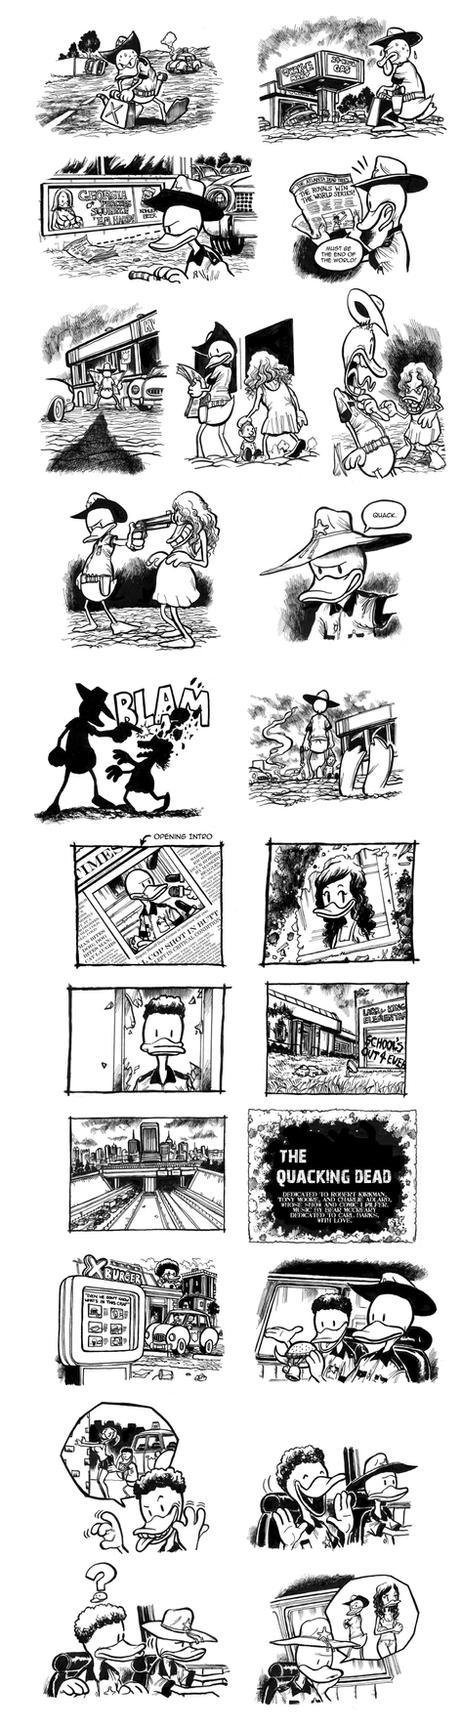 The Quacking Dead Season 1 by cluedog